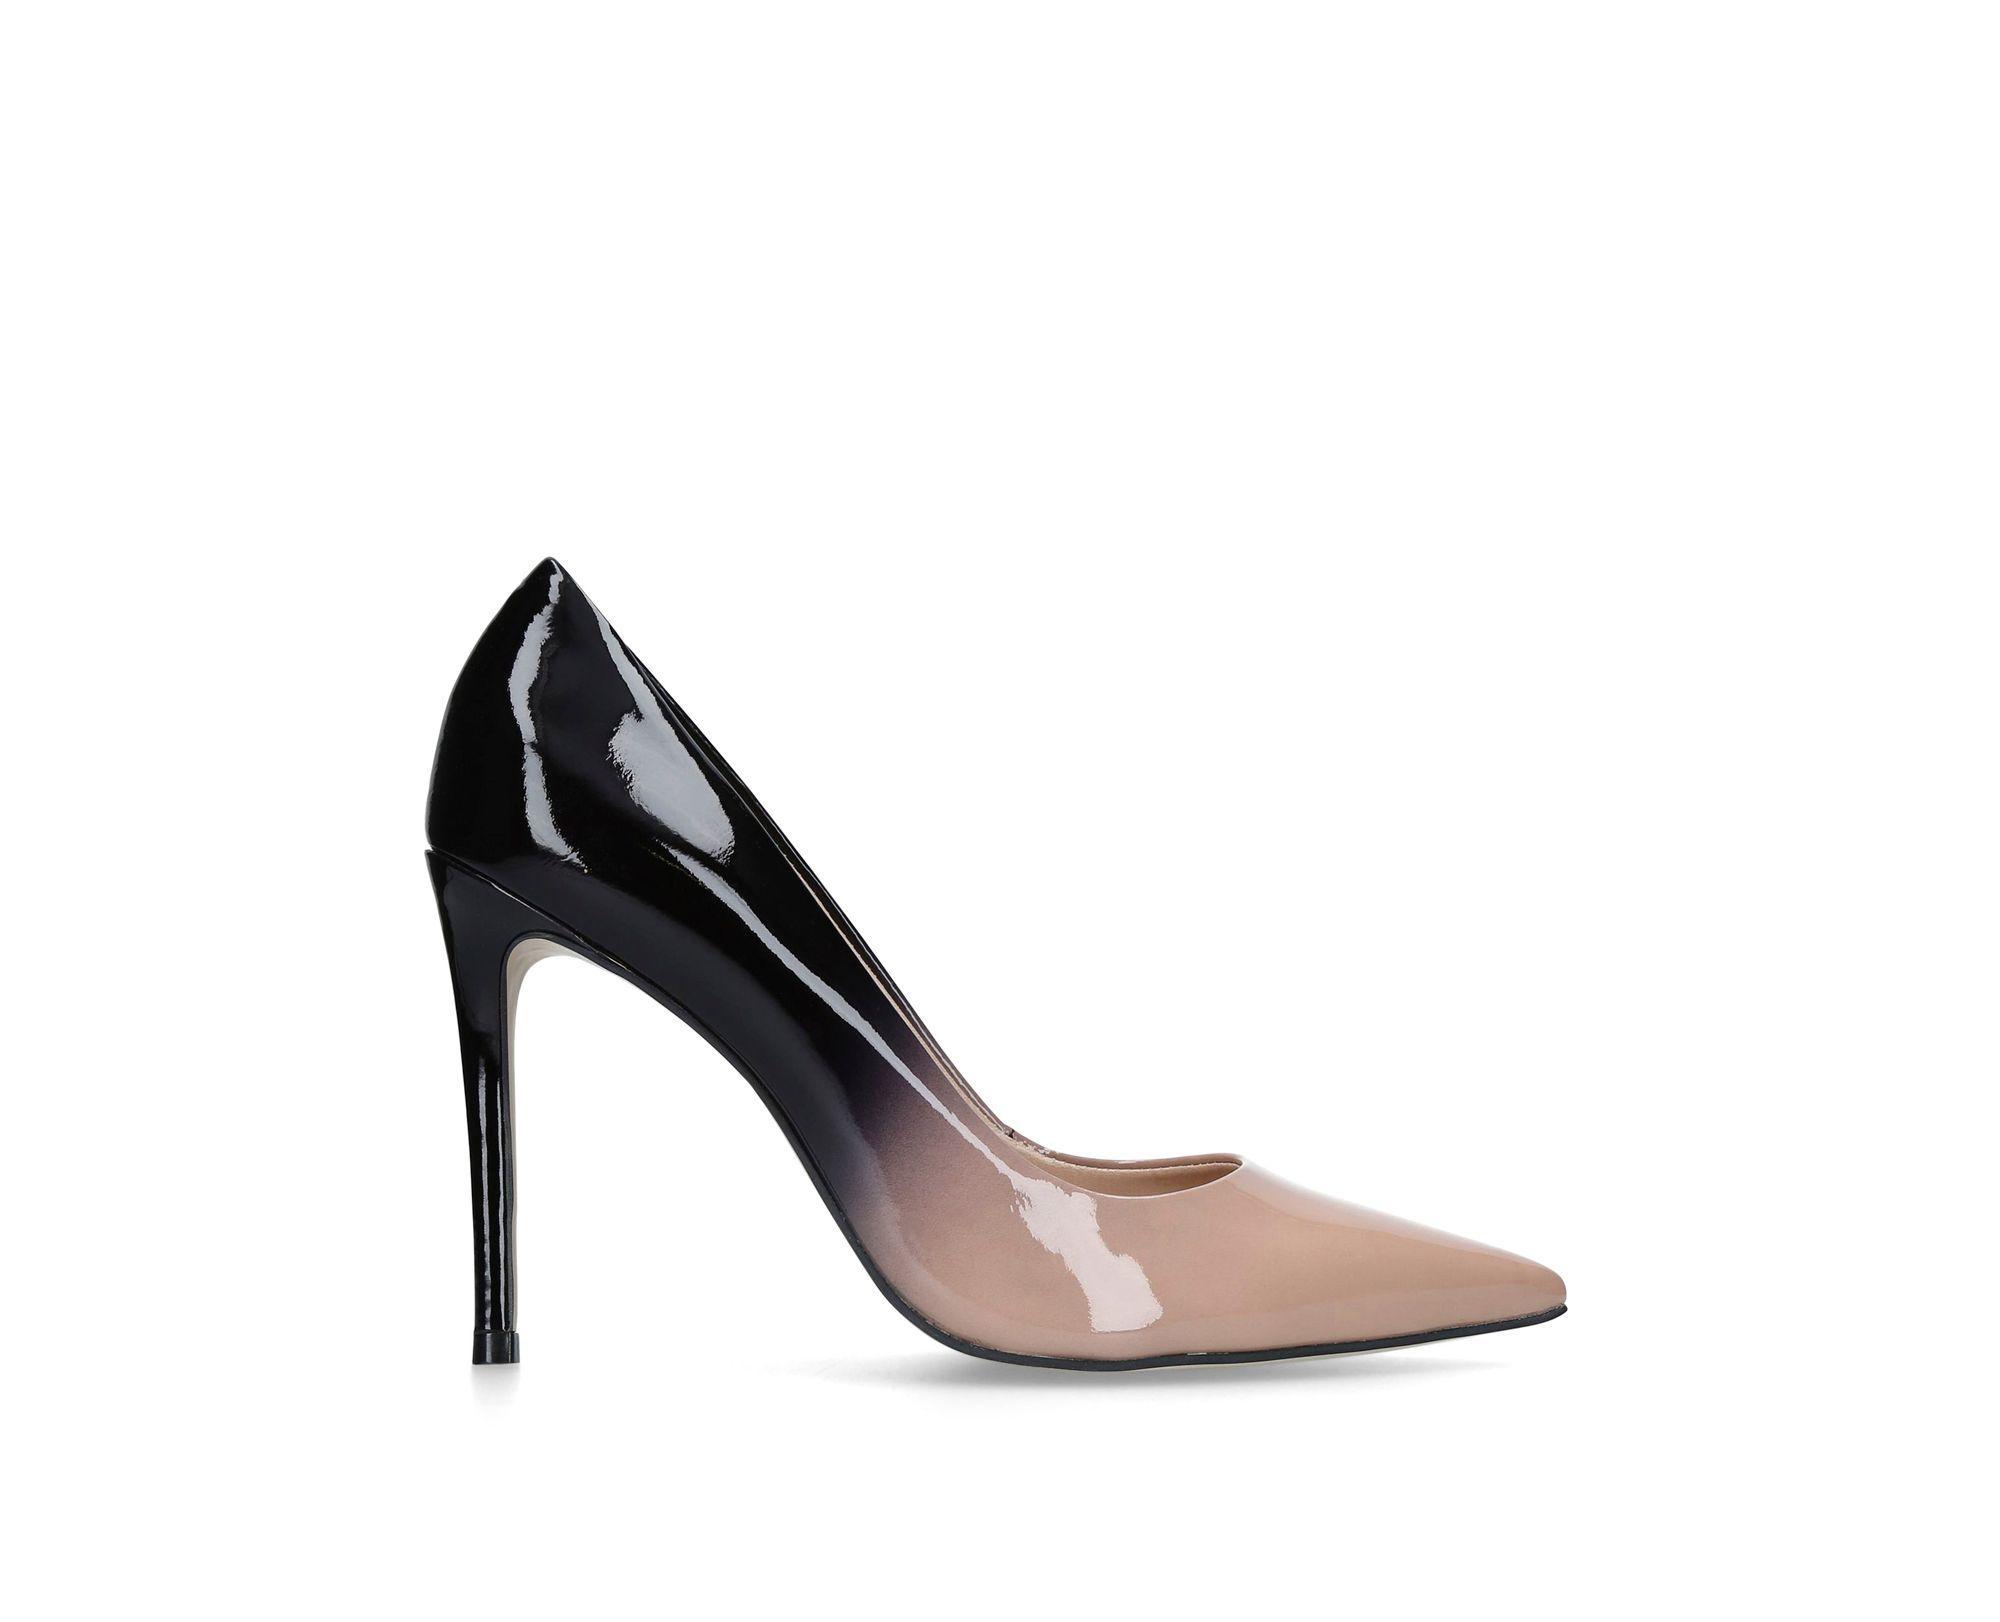 f8461d91e7b Women's Natural Alice Ombr Court Shoes